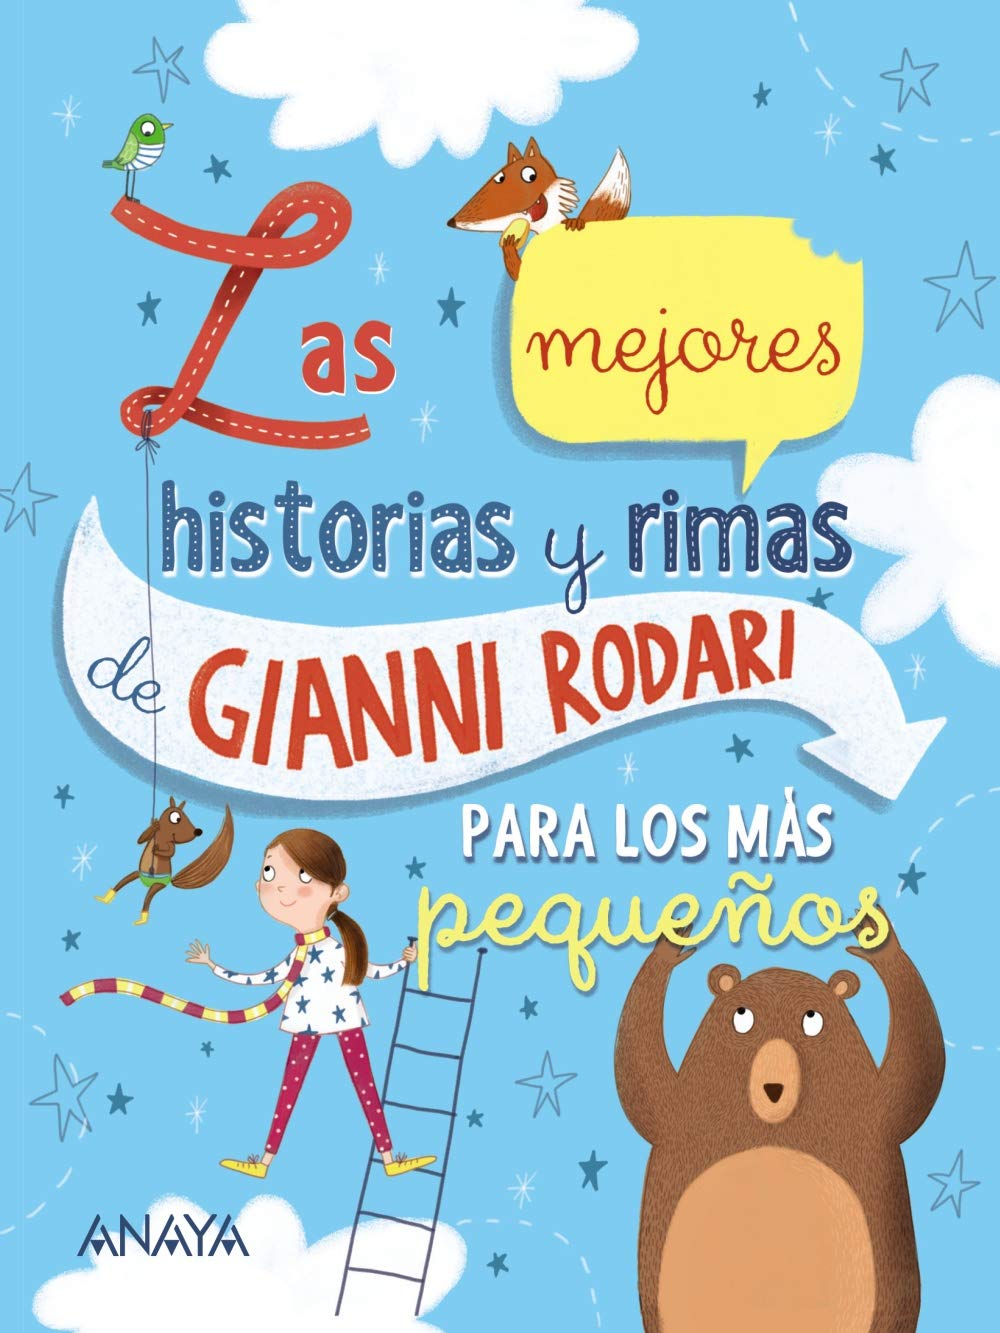 Las mejores historias y rimas de Gianni Rodari - Selección de libros de Gianni Rodari